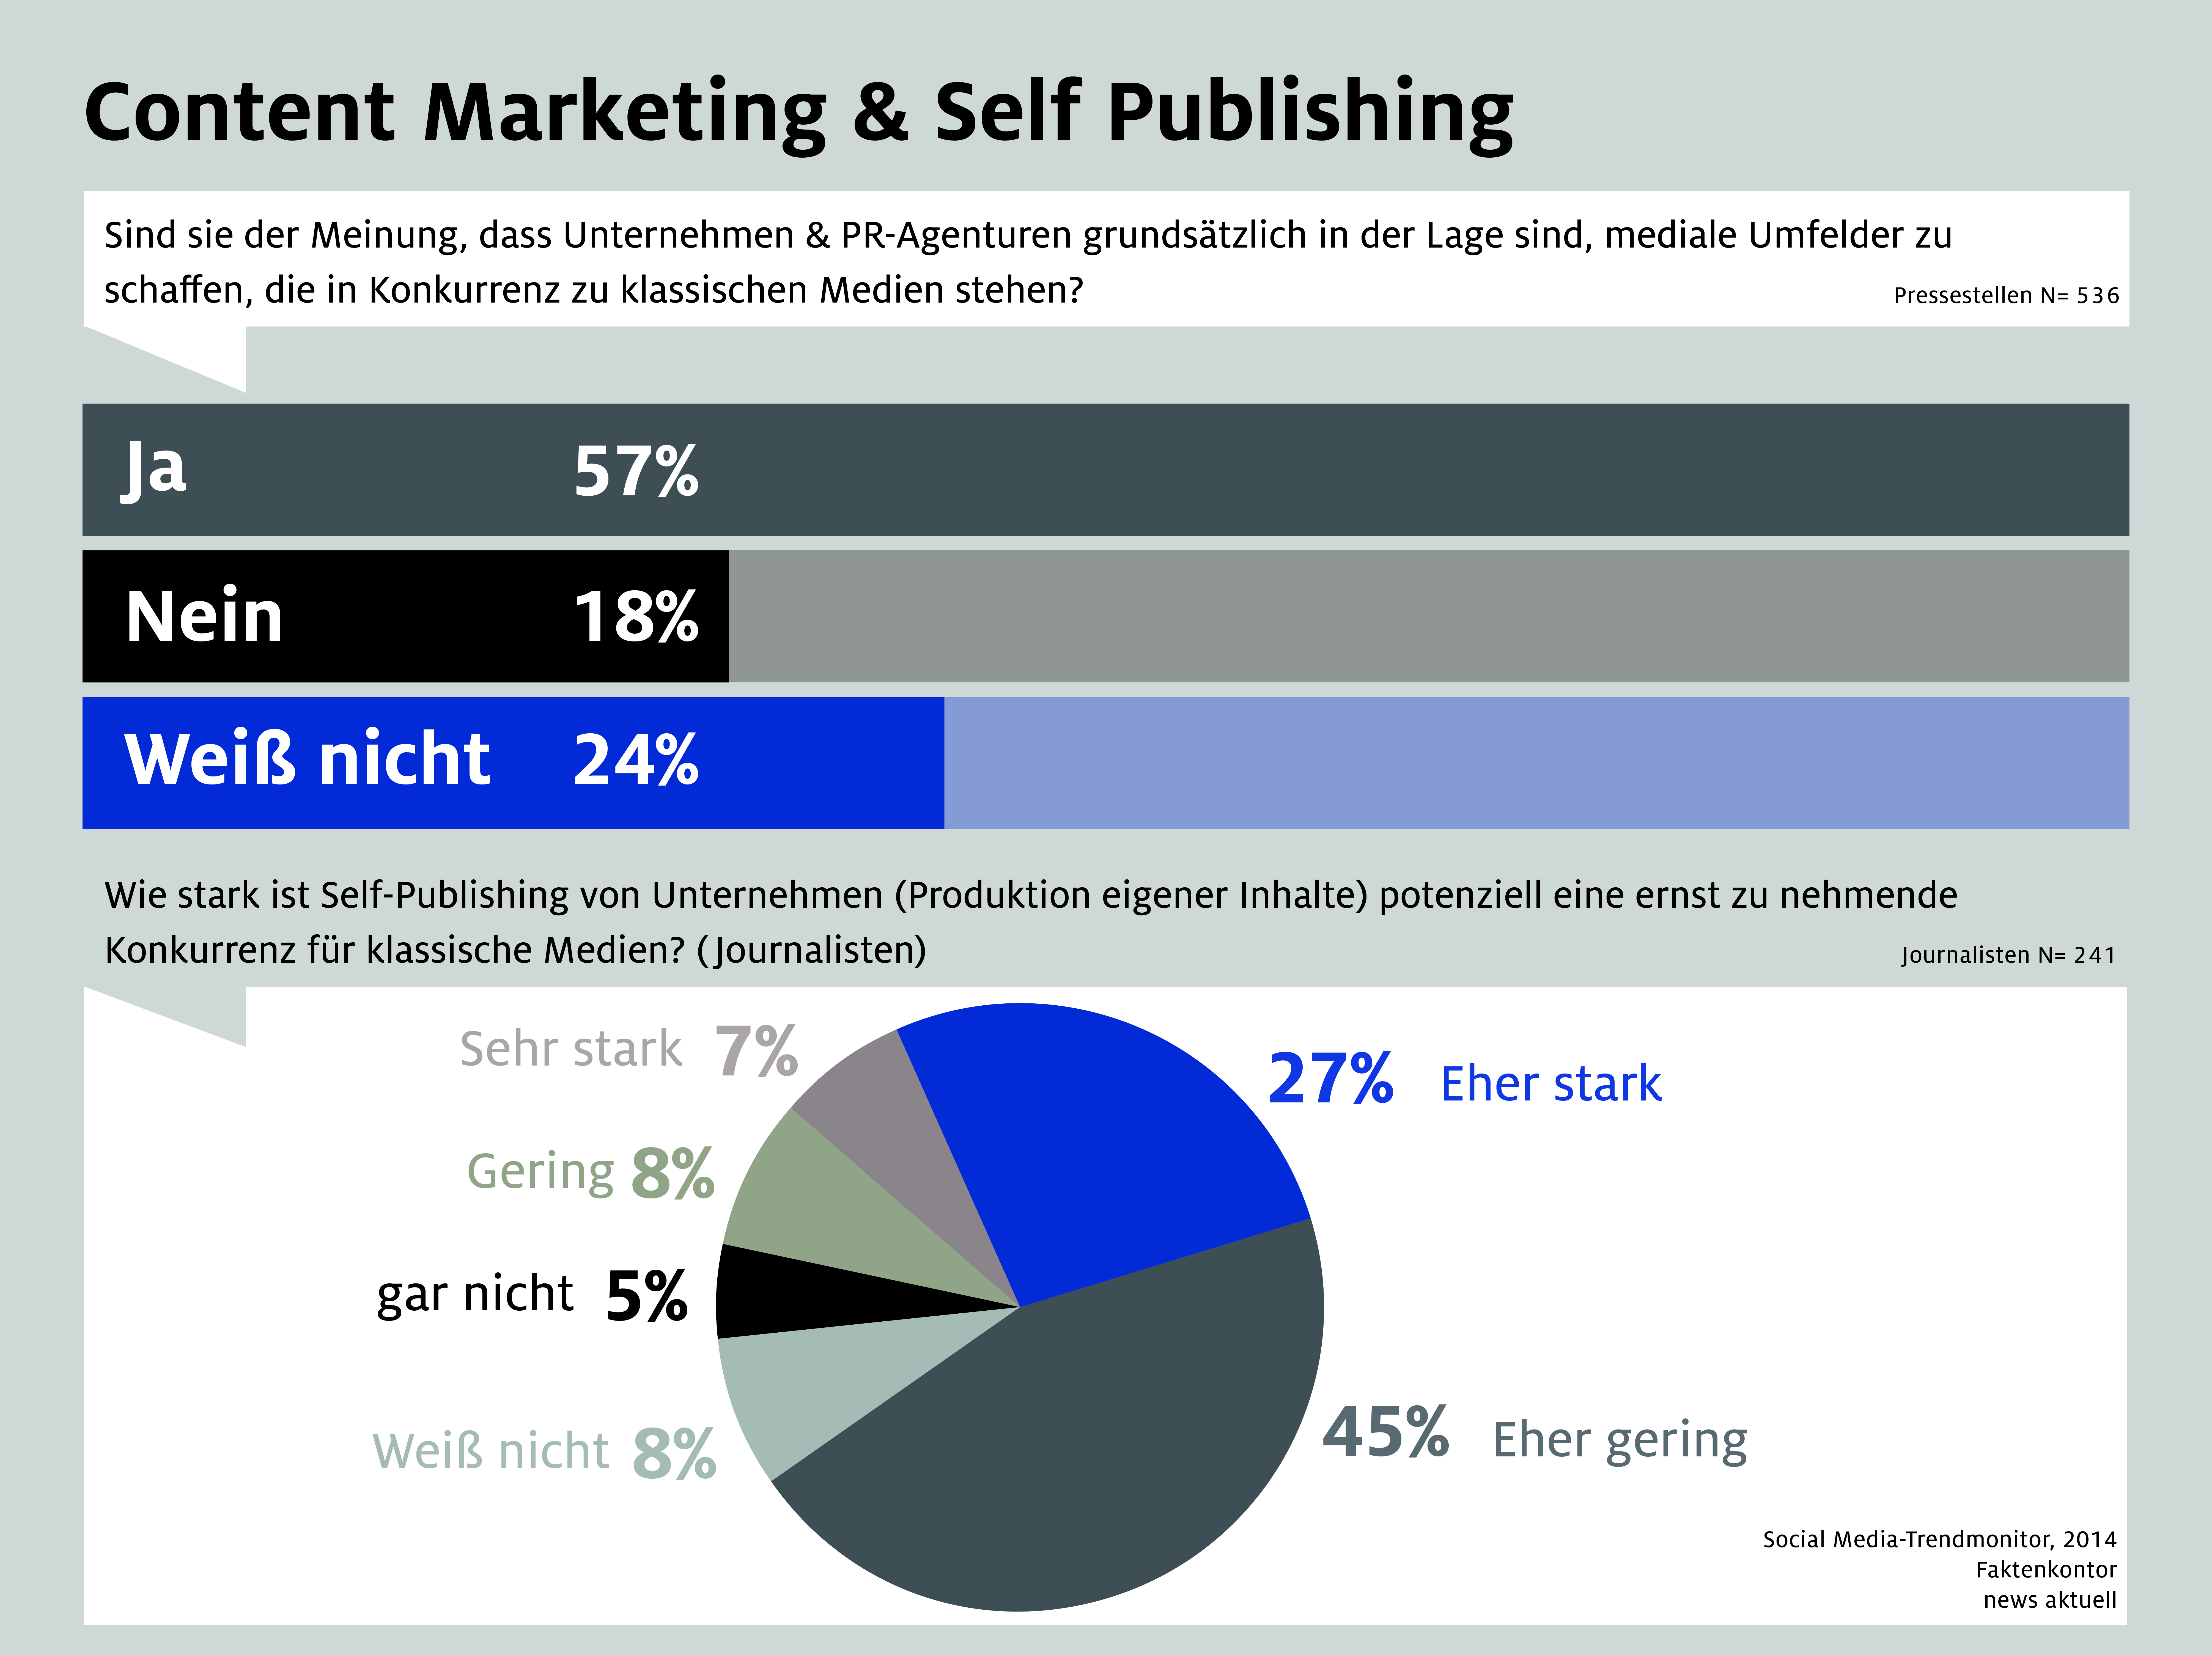 Content Marketing & Self Publishing 2